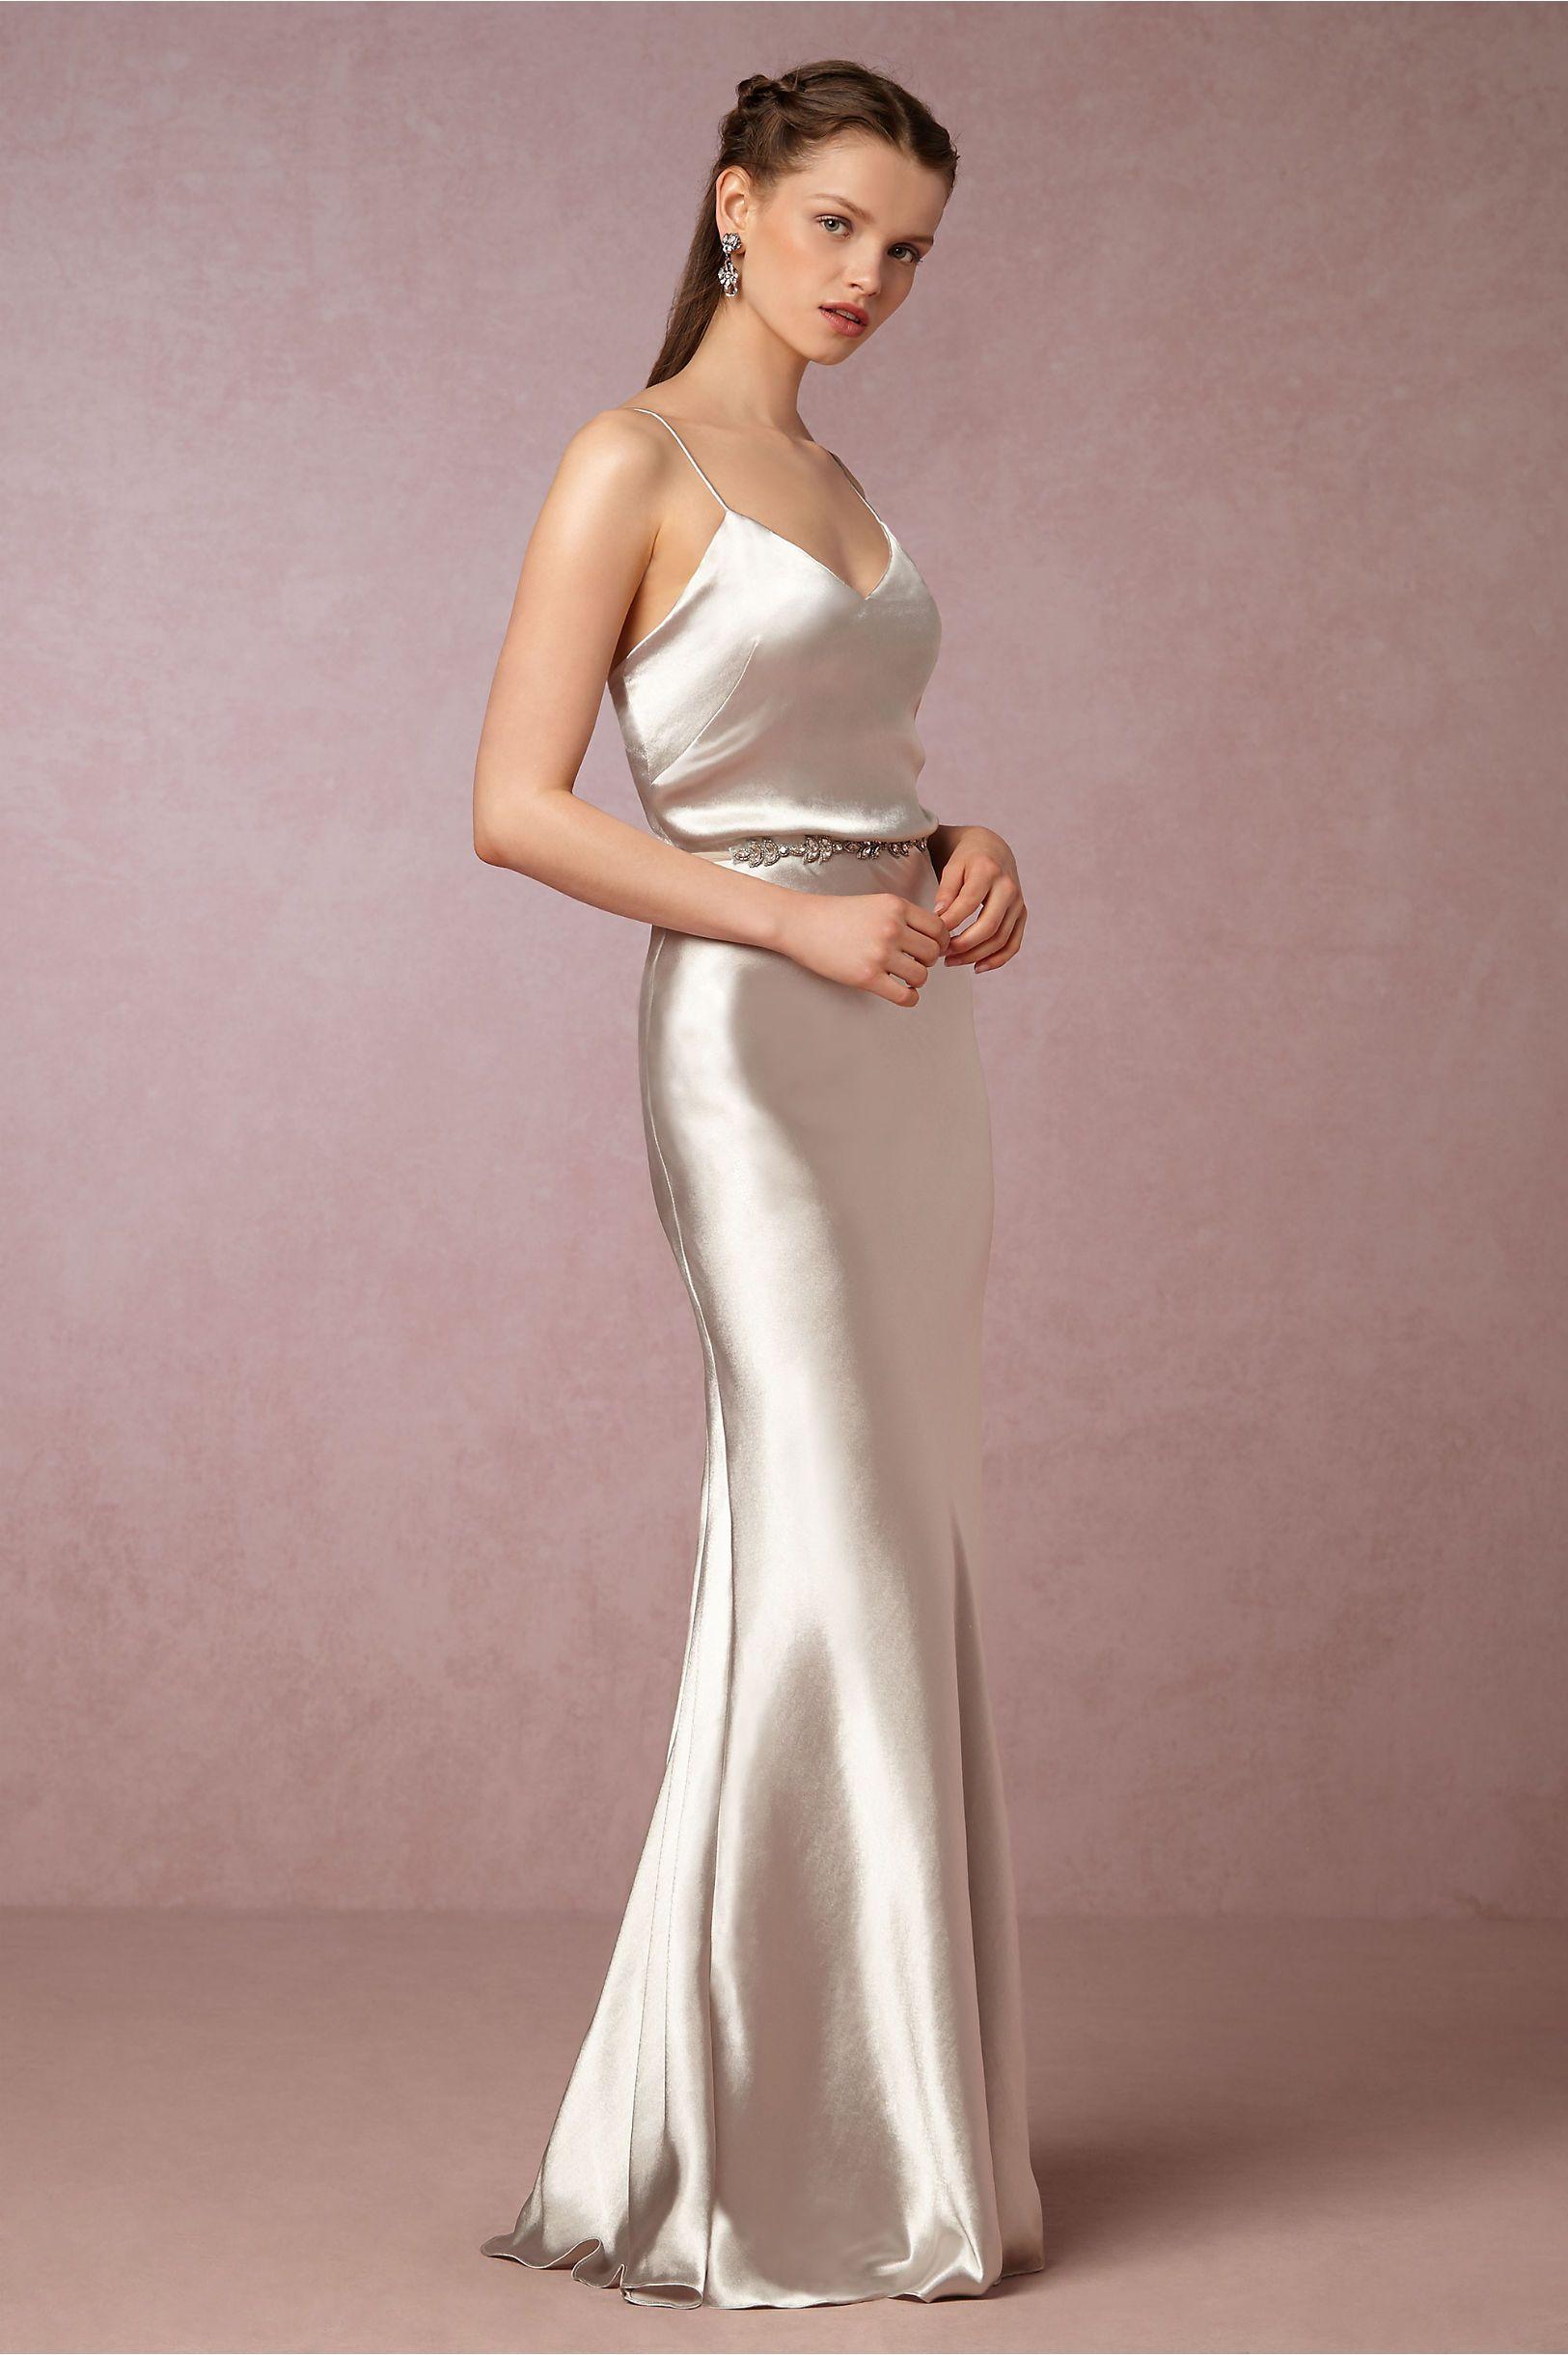 BHLDN Sylvana Dress in Bridesmaids Maid of Honor Dresses at BHLDN ...